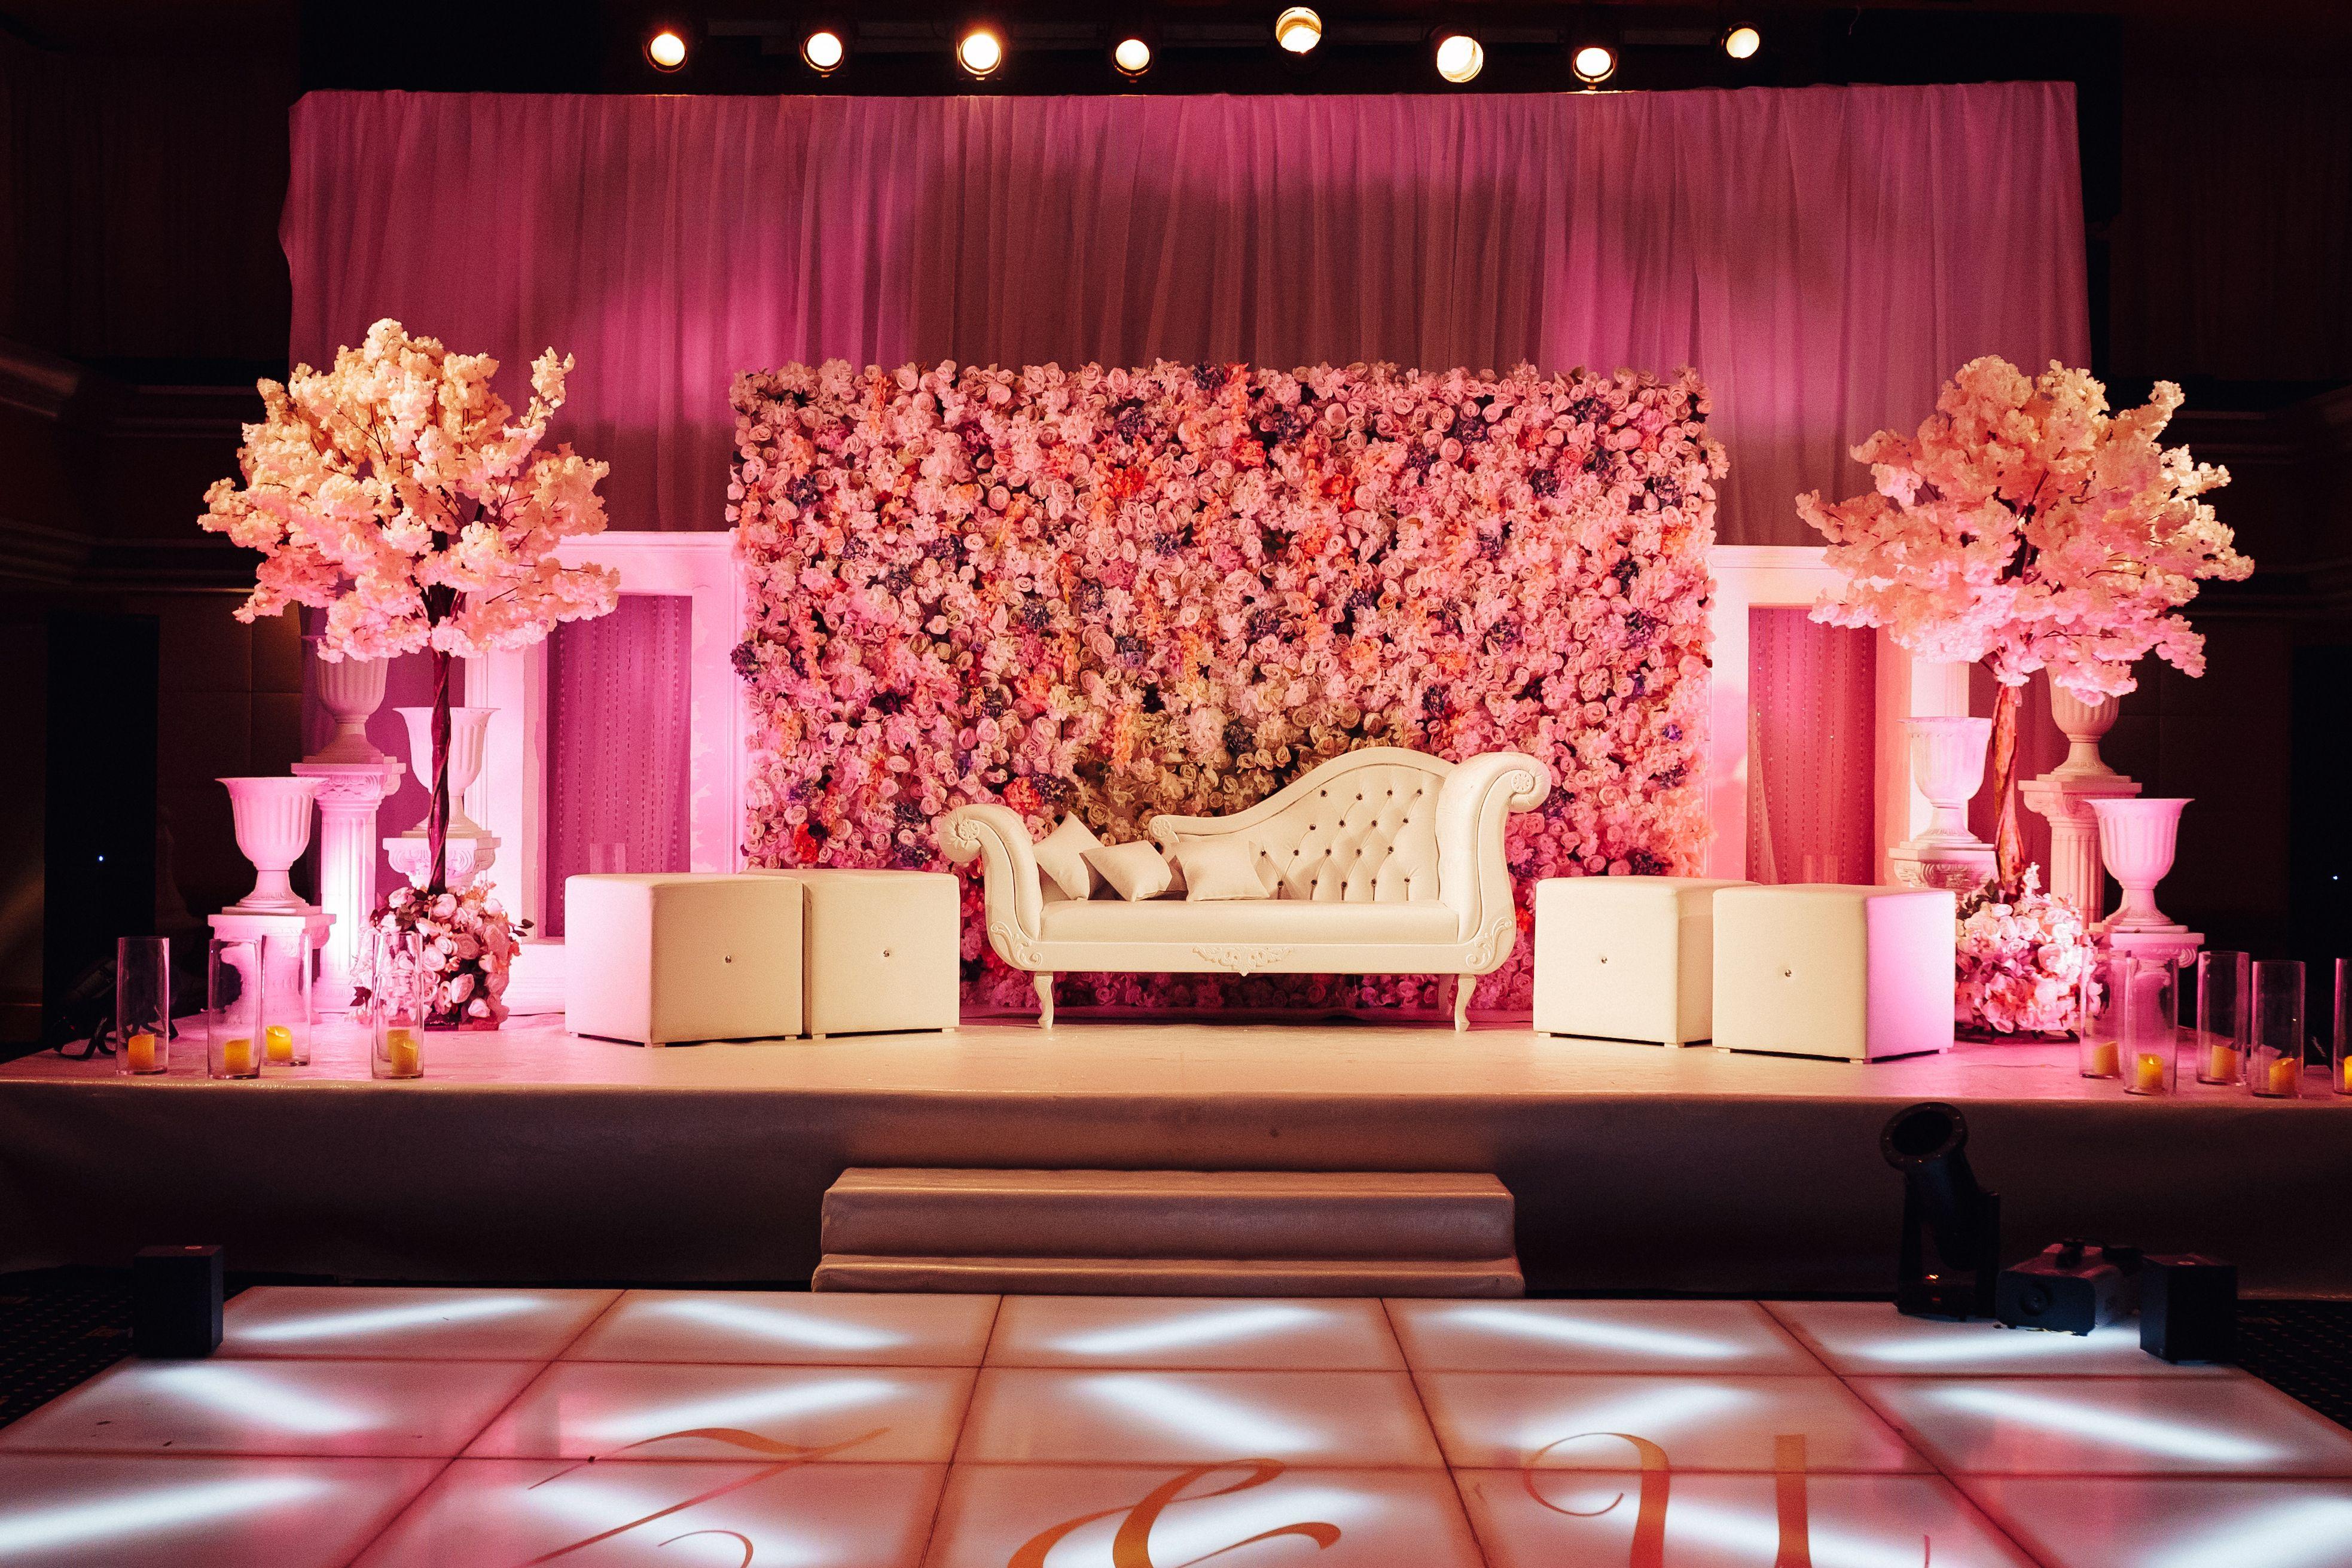 Stunning Wedding Stage Decorations Bridal Fashion Inspiration Wedding Lialievents Wedding Stage Decorations Engagement Stage Decoration Wedding Stage